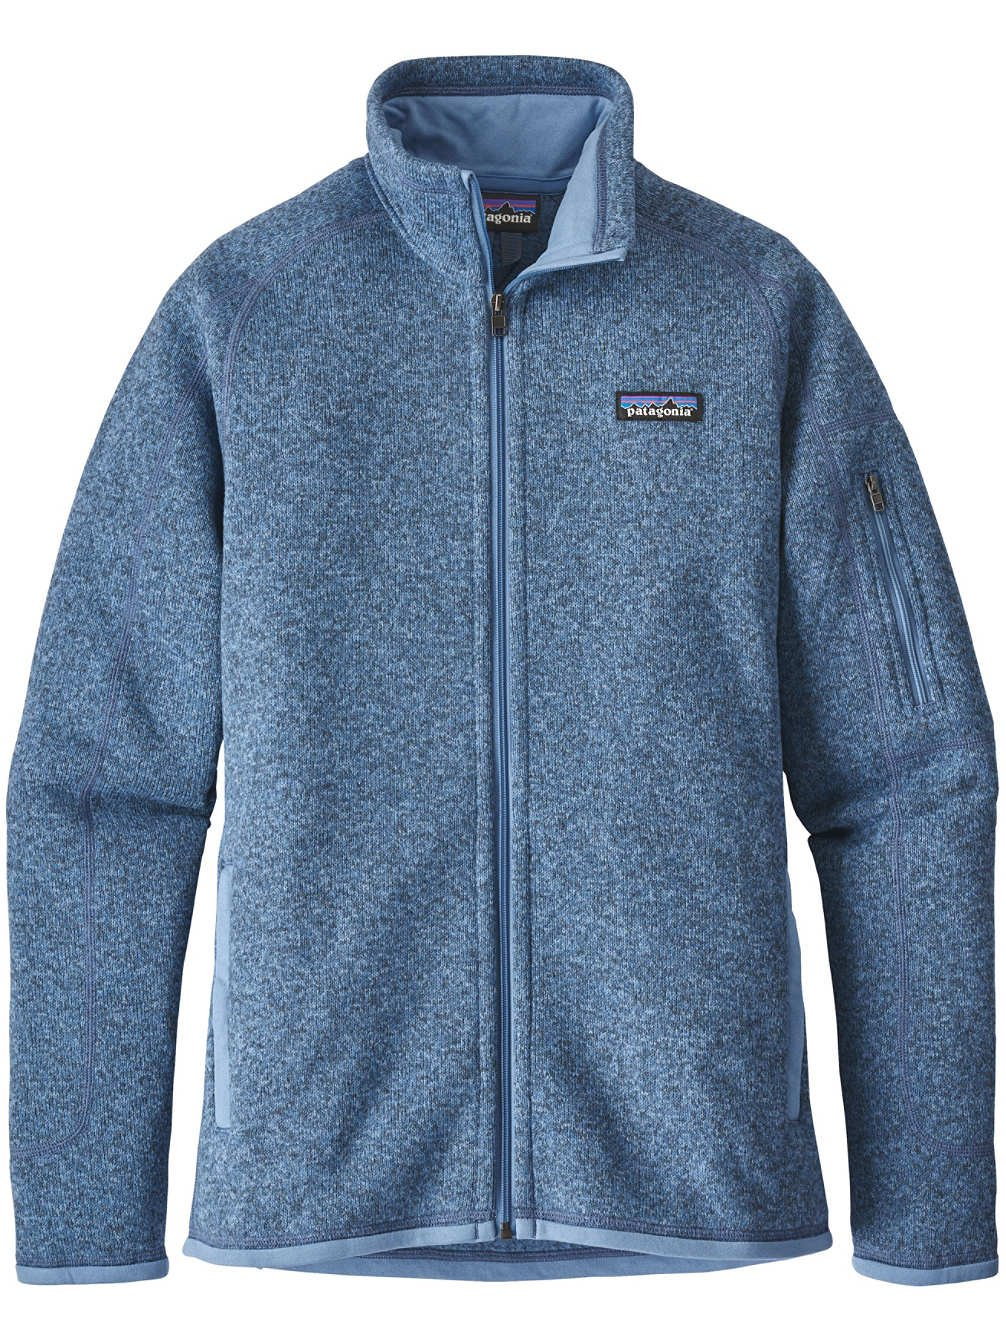 Patagonia Women's Better Sweater Jacket Railroad Blue (Medium, Railroad Blue)